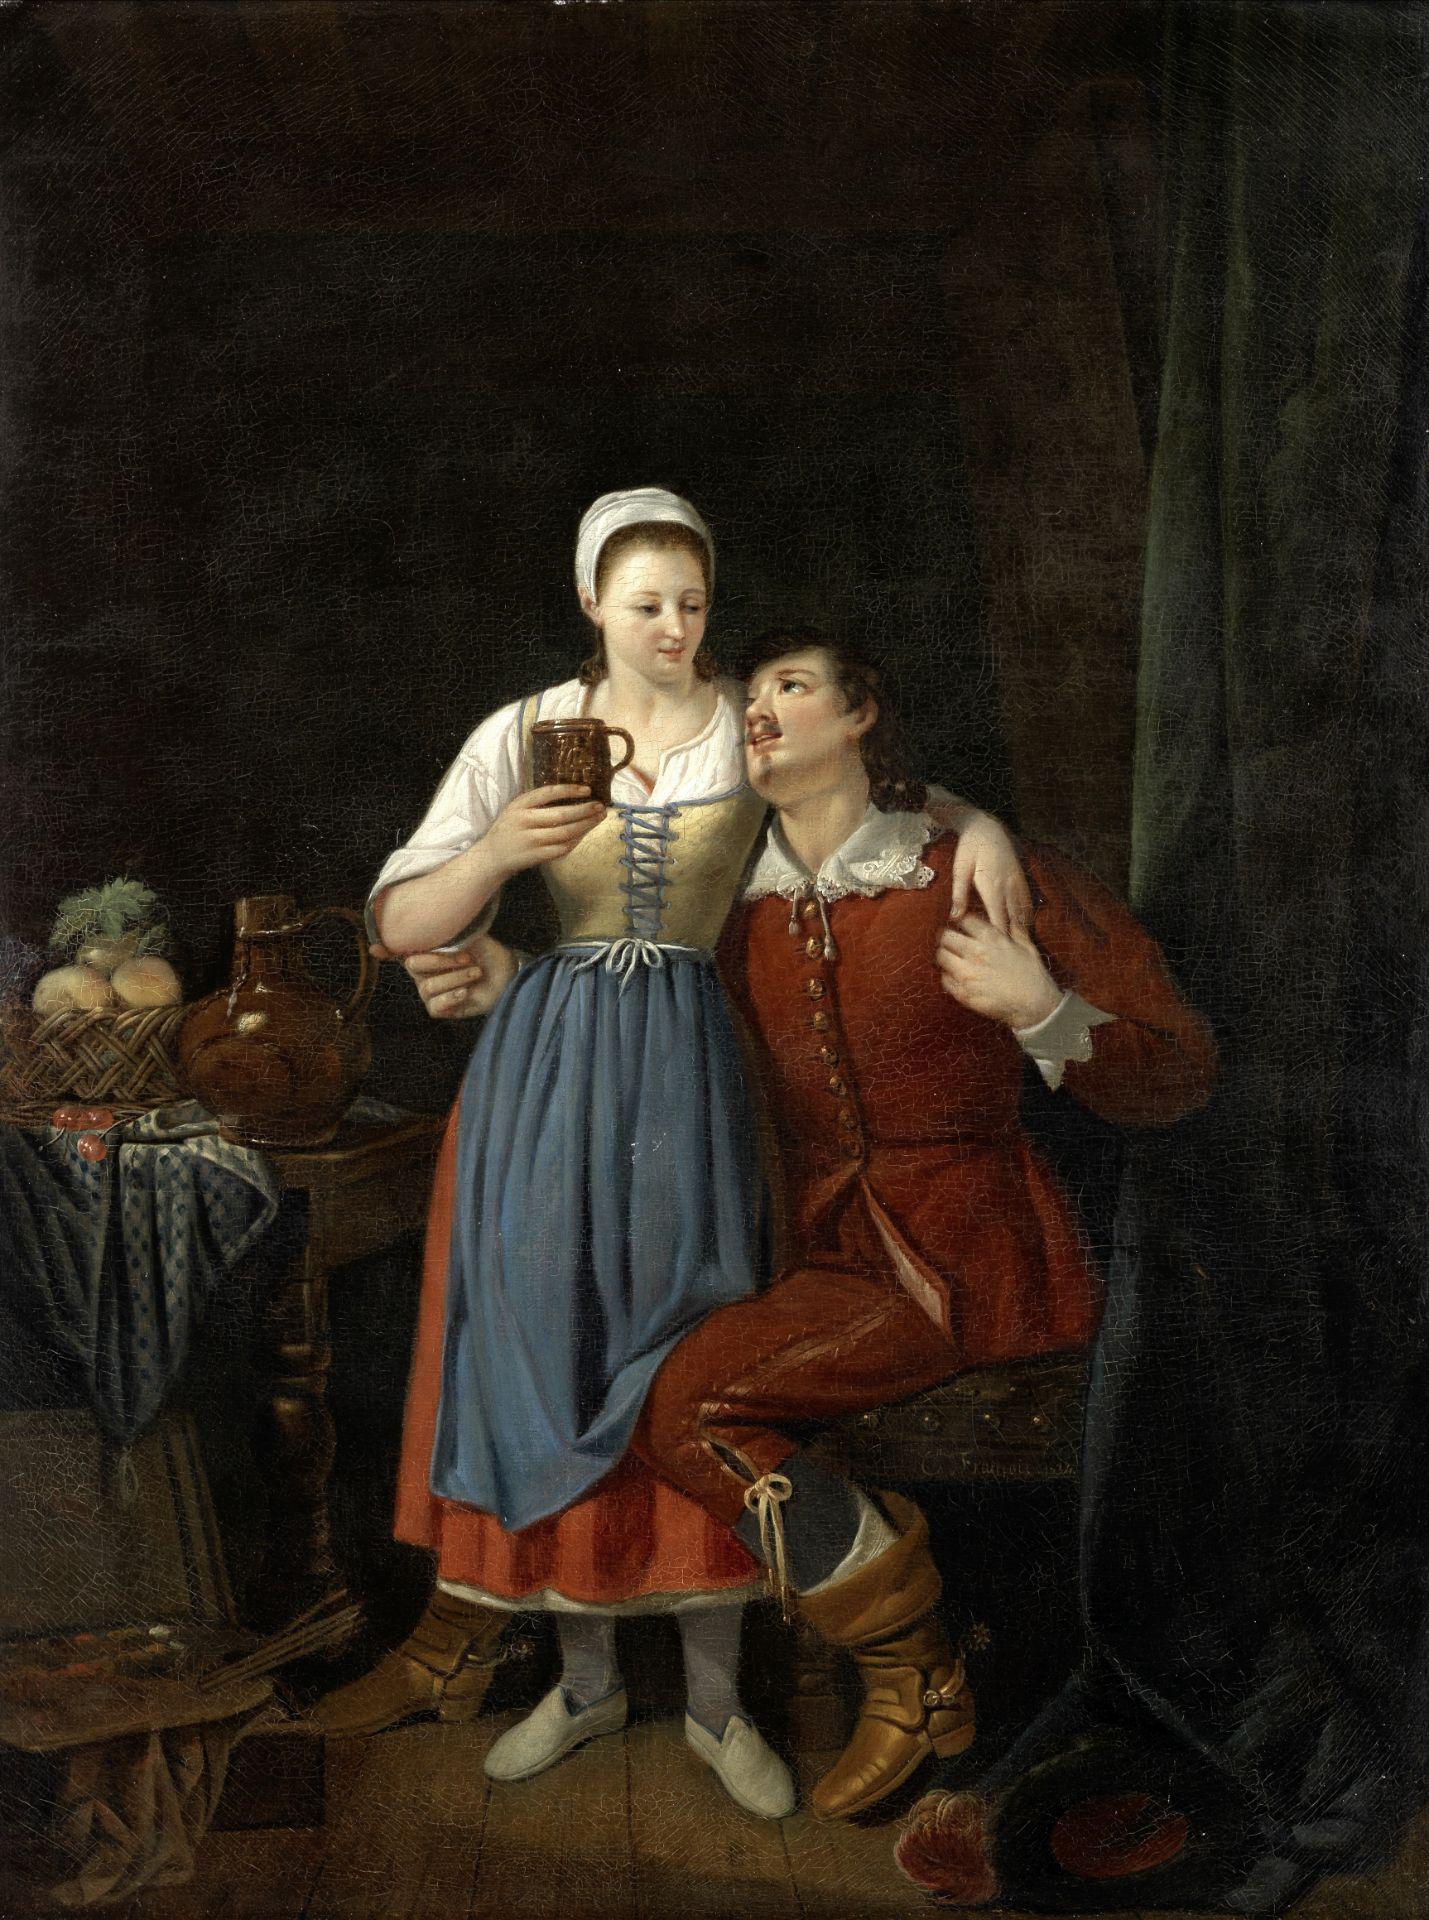 Célestin Francois (Belgian, 1787-1846) Tavern scene